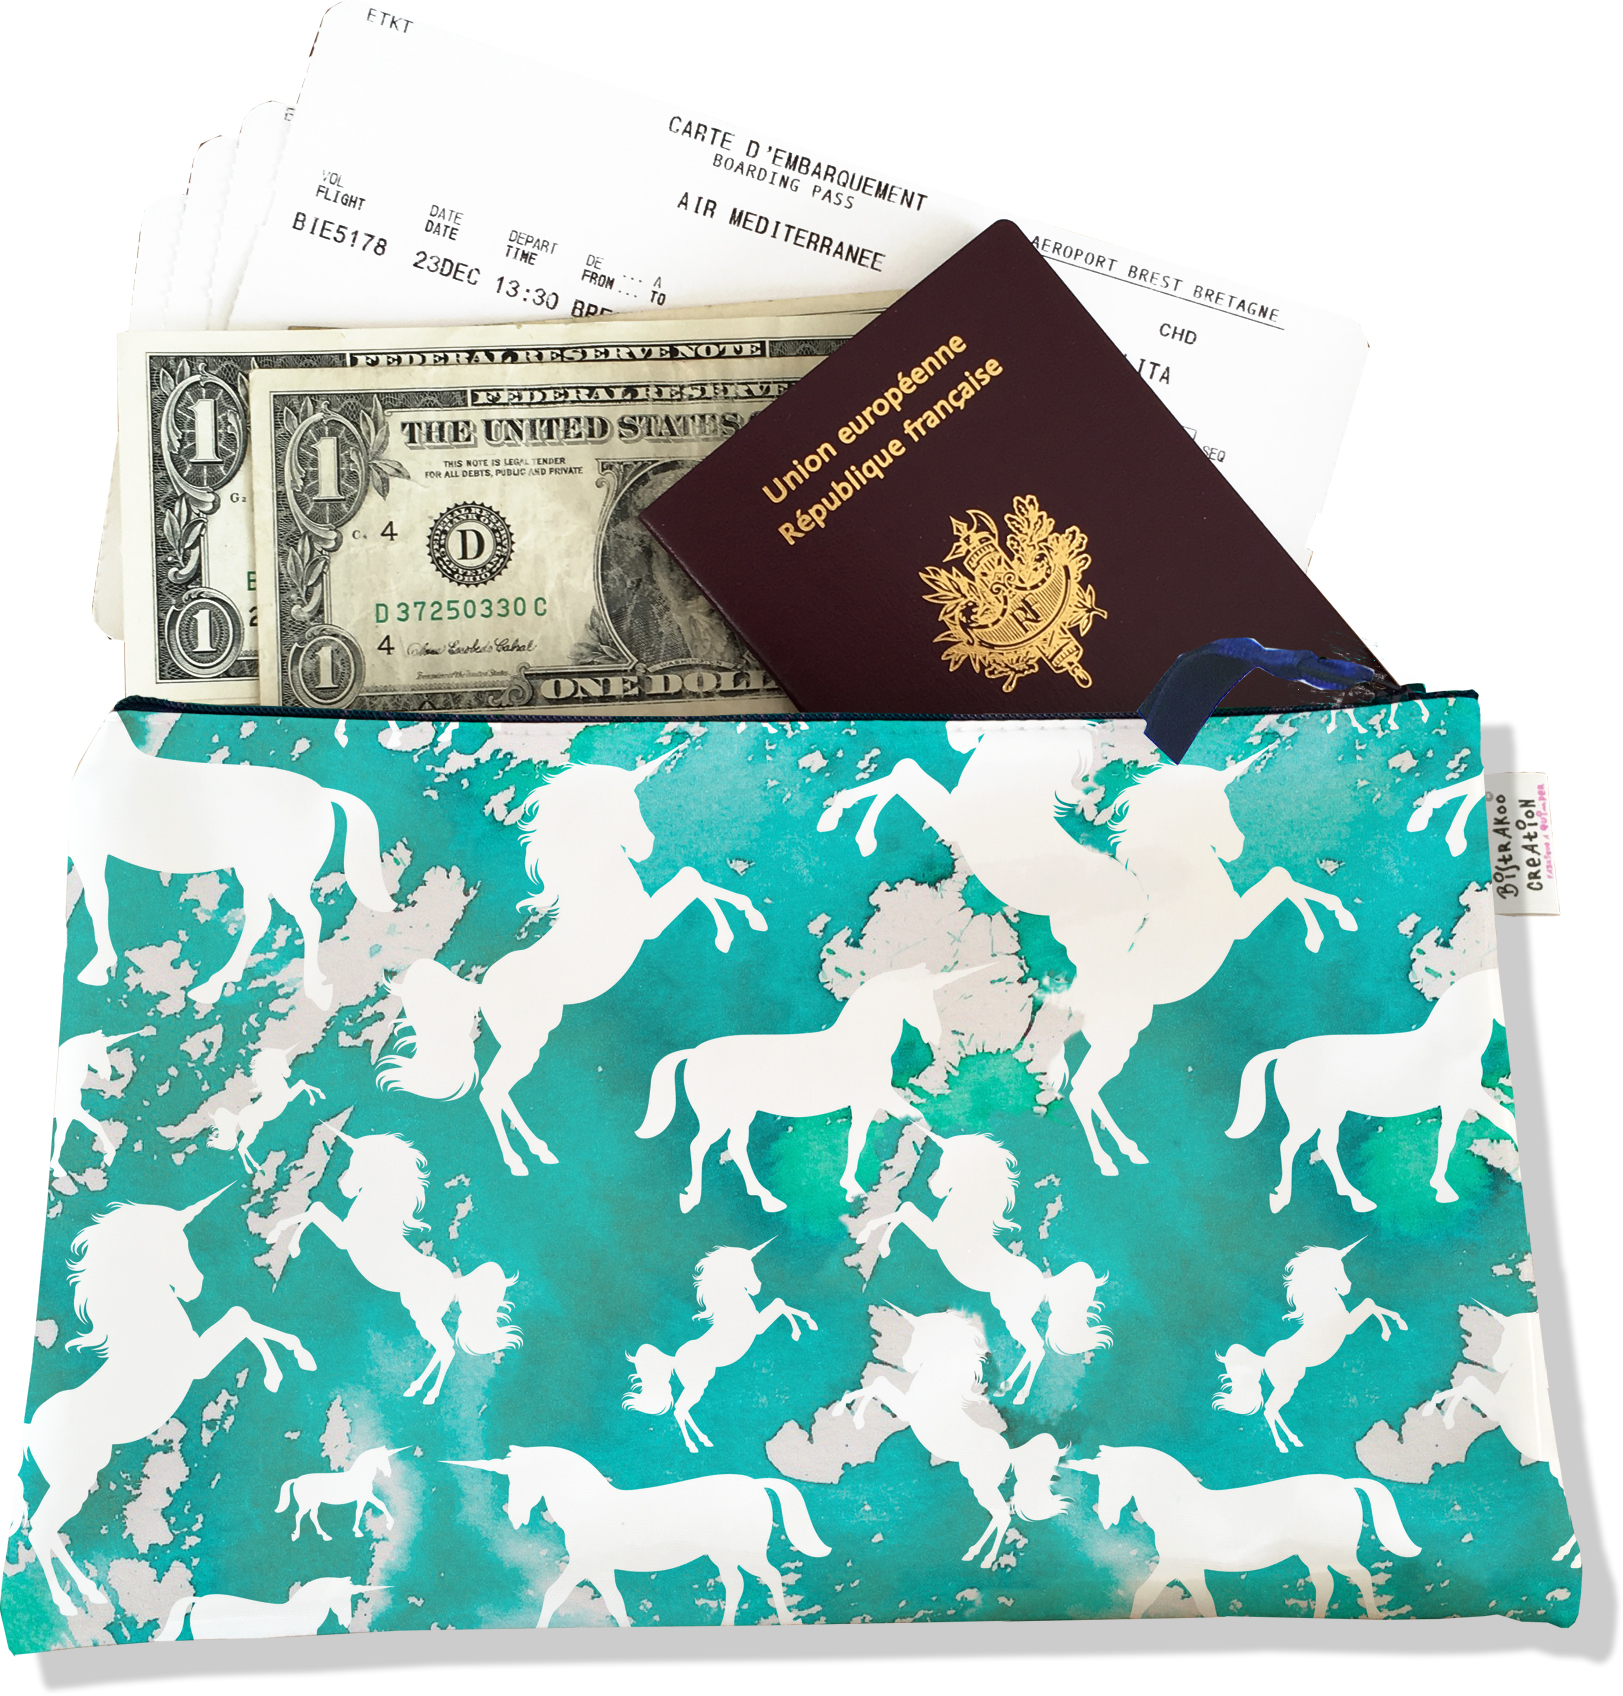 Pochette voyage, porte documents pour femme motif Licorne bleu PV6002-2015